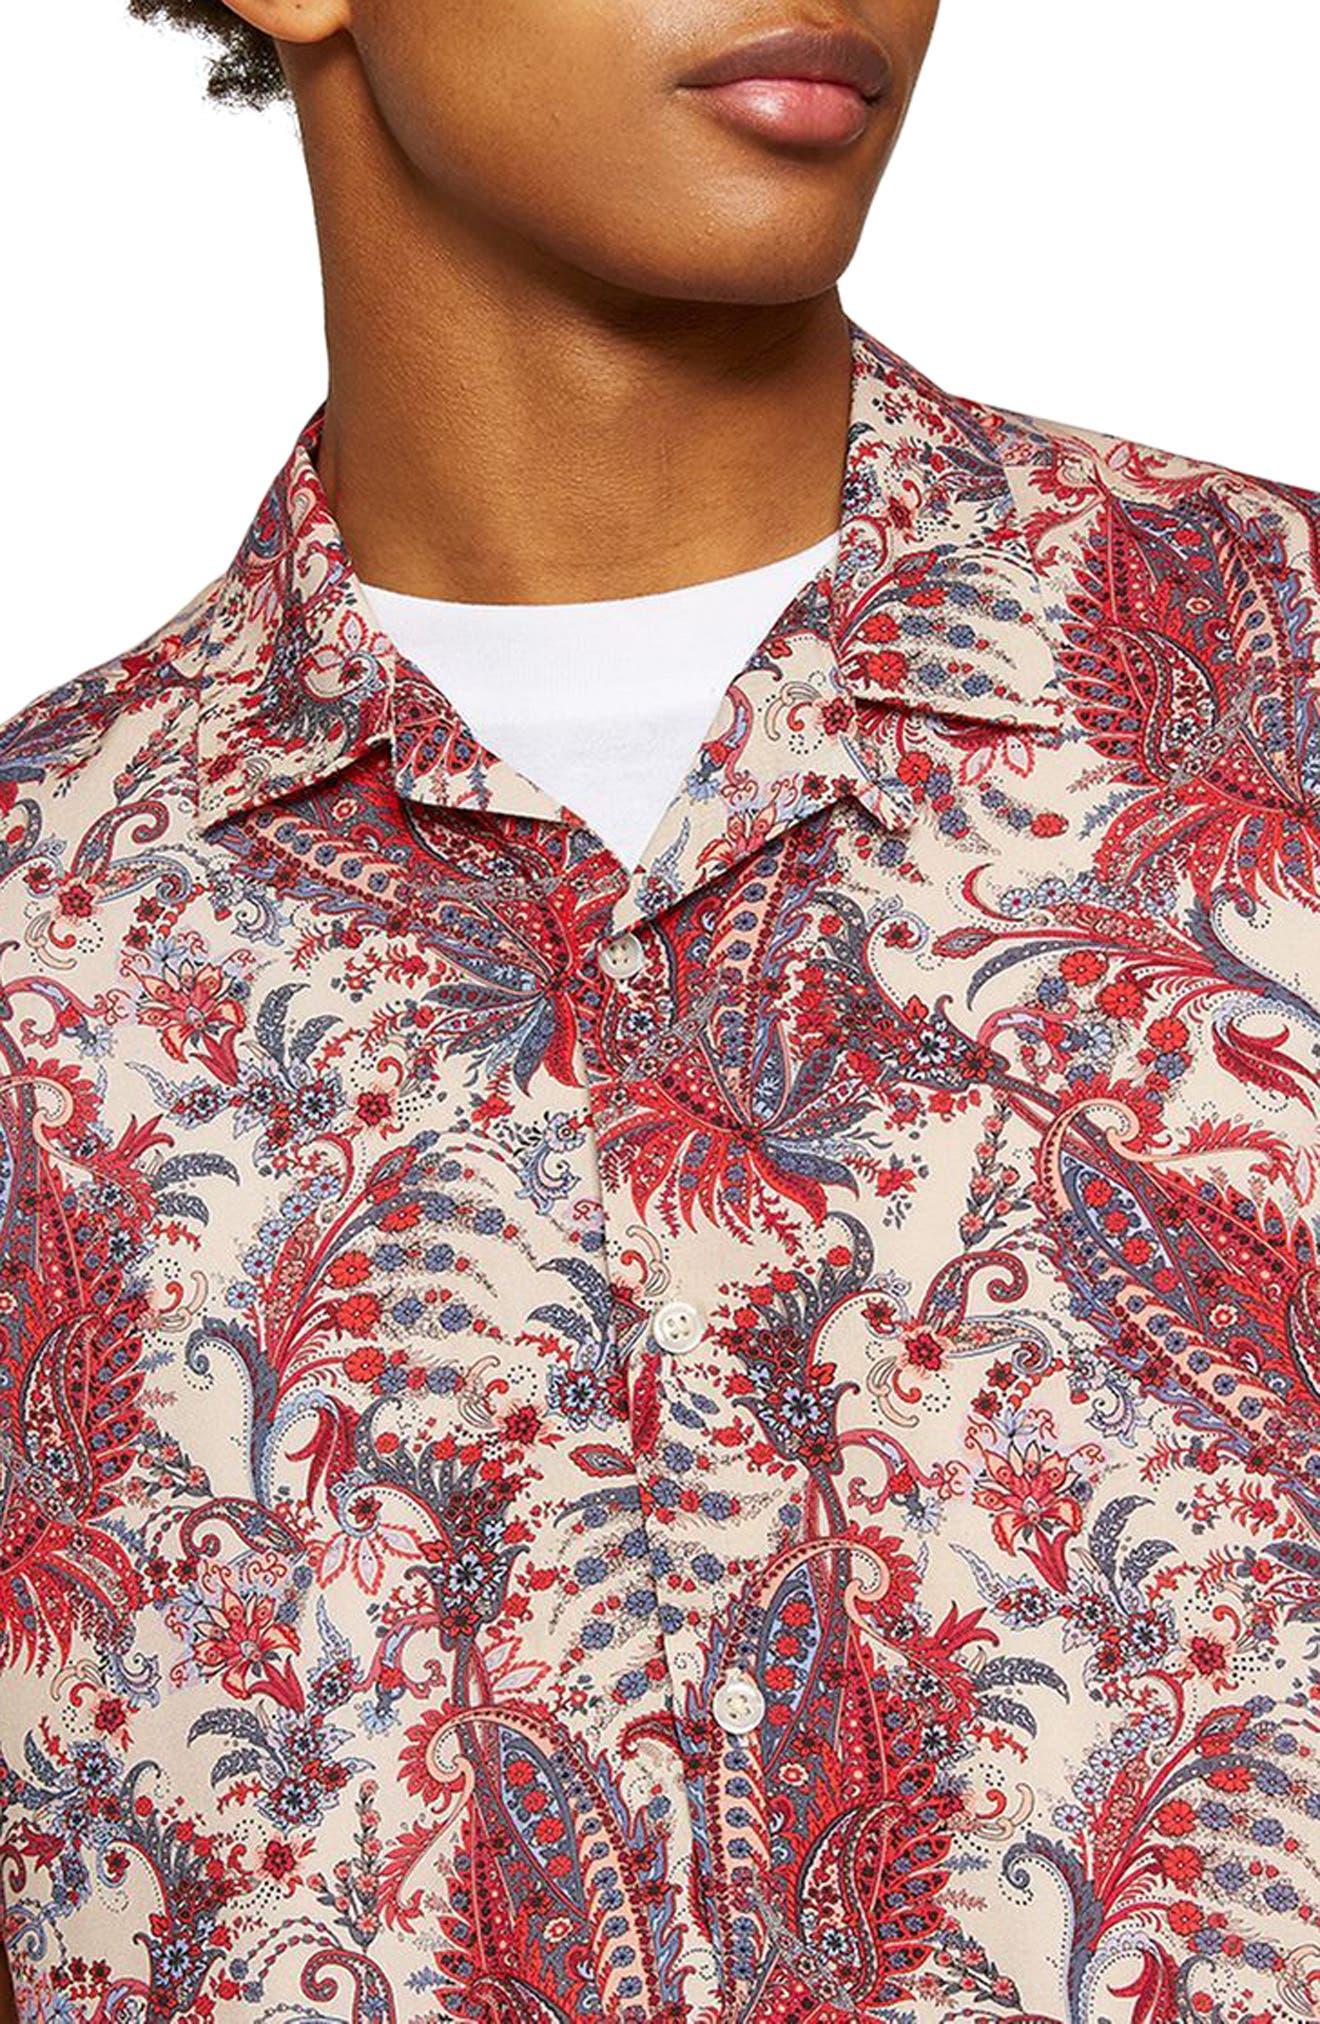 Paisley Camp Shirt,                             Alternate thumbnail 3, color,                             PINK MULTI